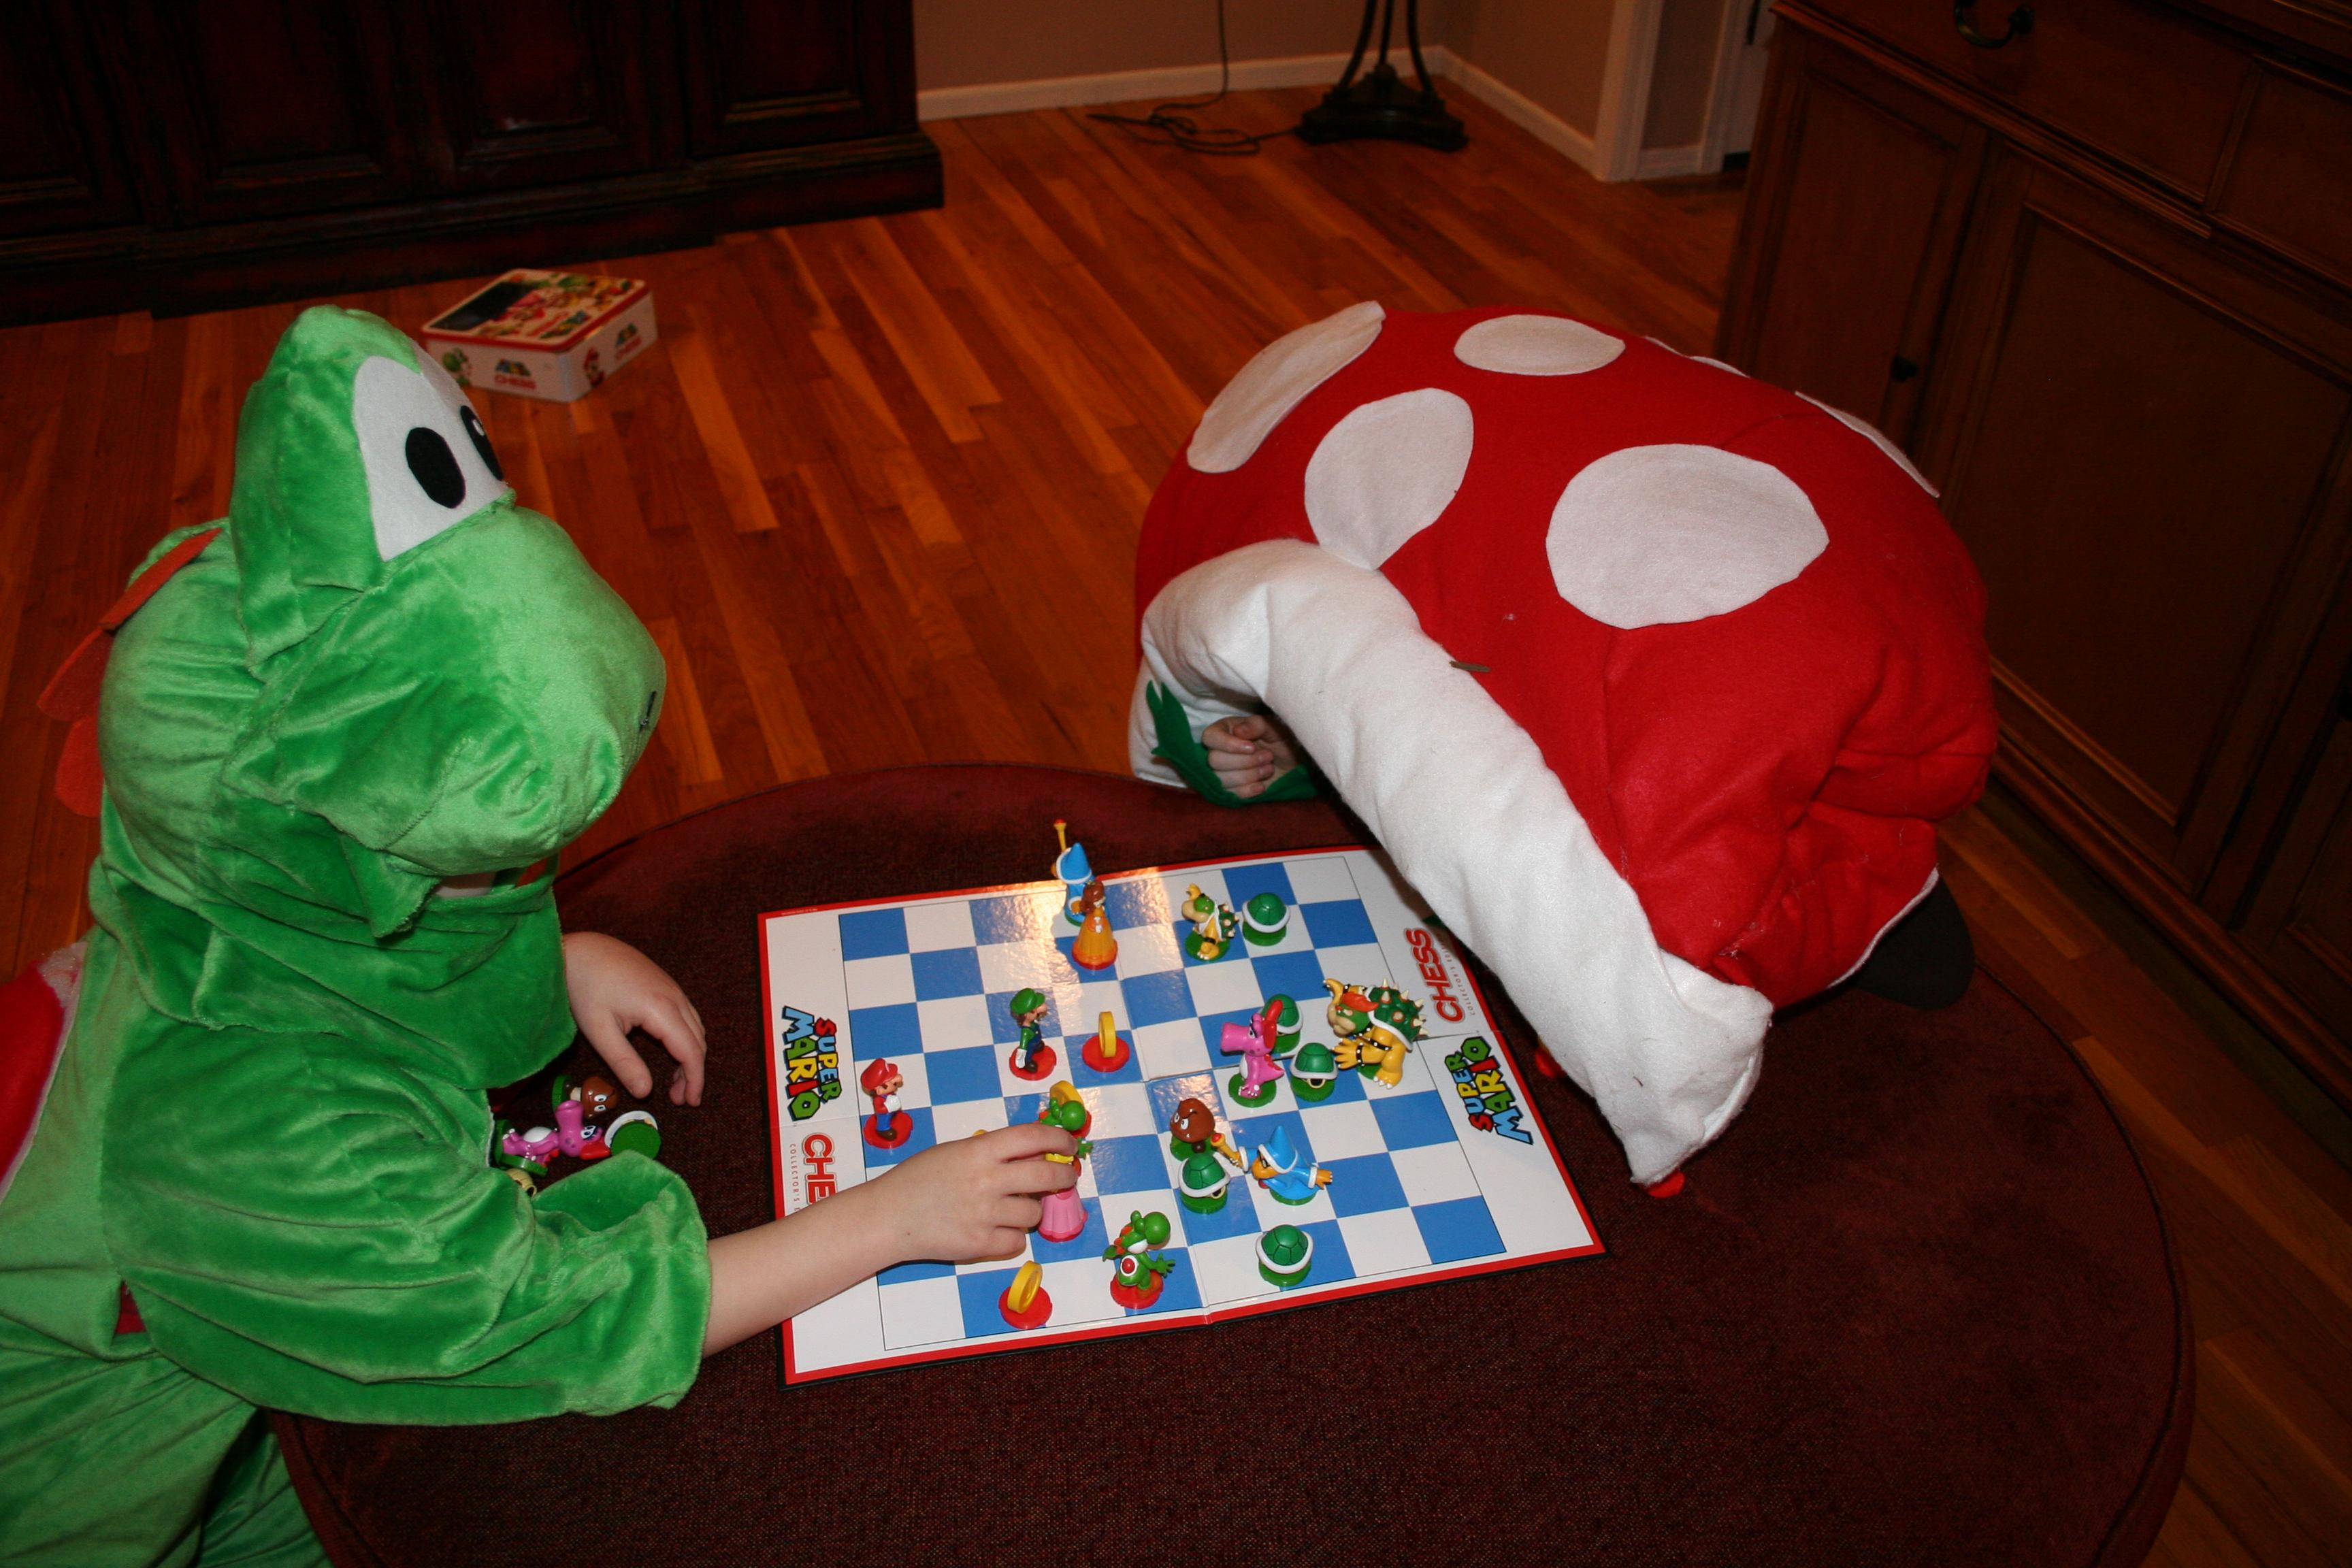 Yoshi playing Mario Chess